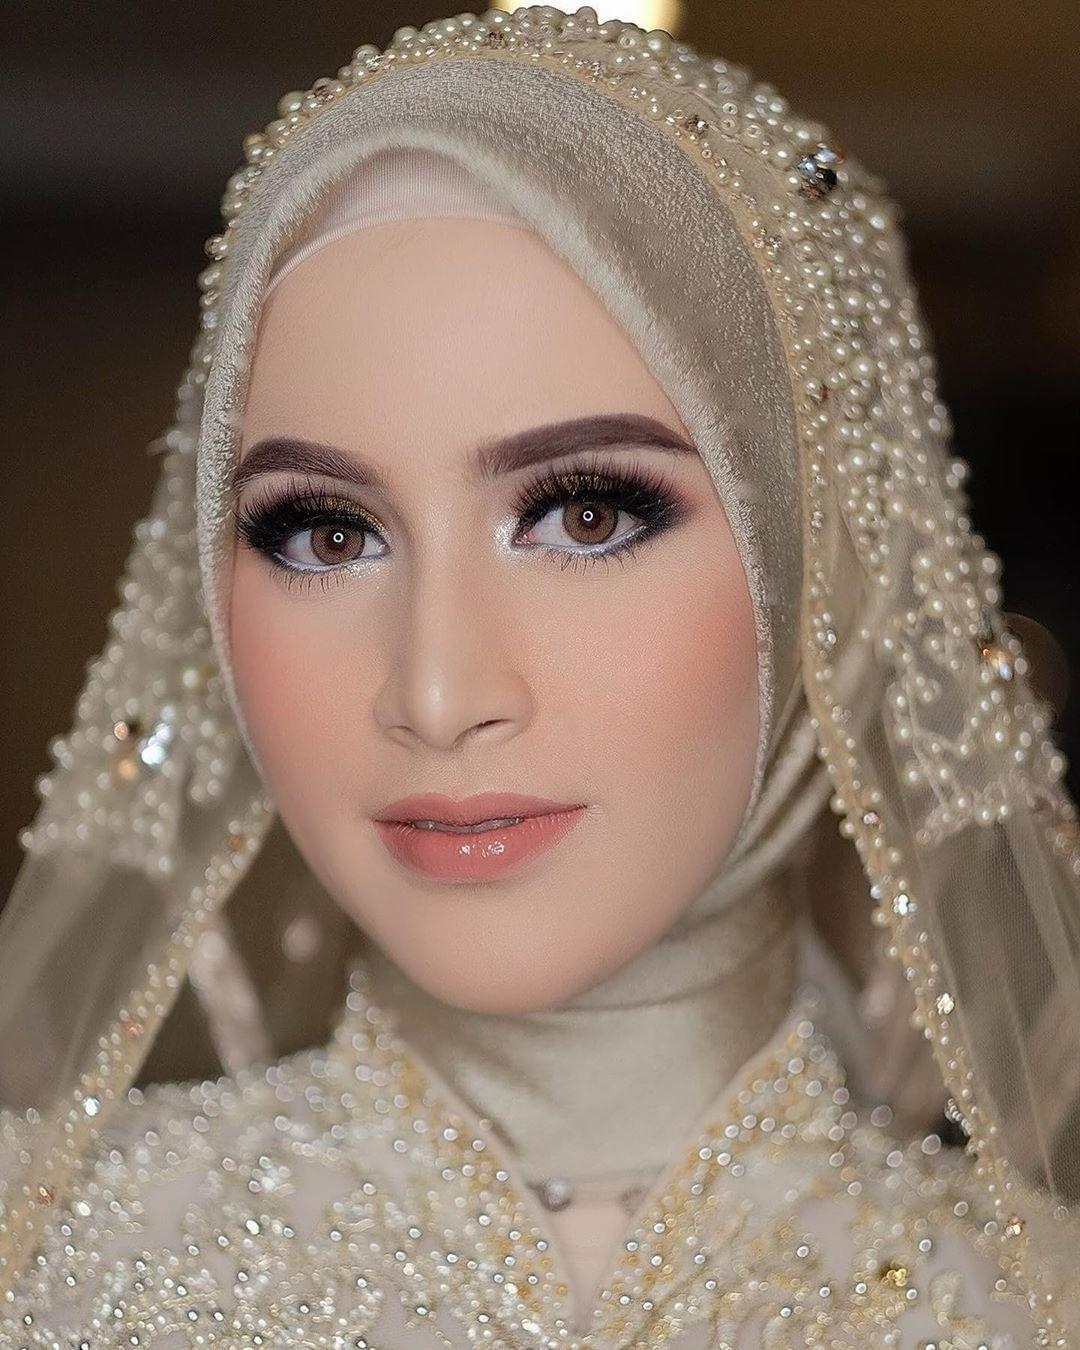 Wedding Makeup Di 2020 Kerudung Pengantin Rias Wajah Pengantin Pengantin